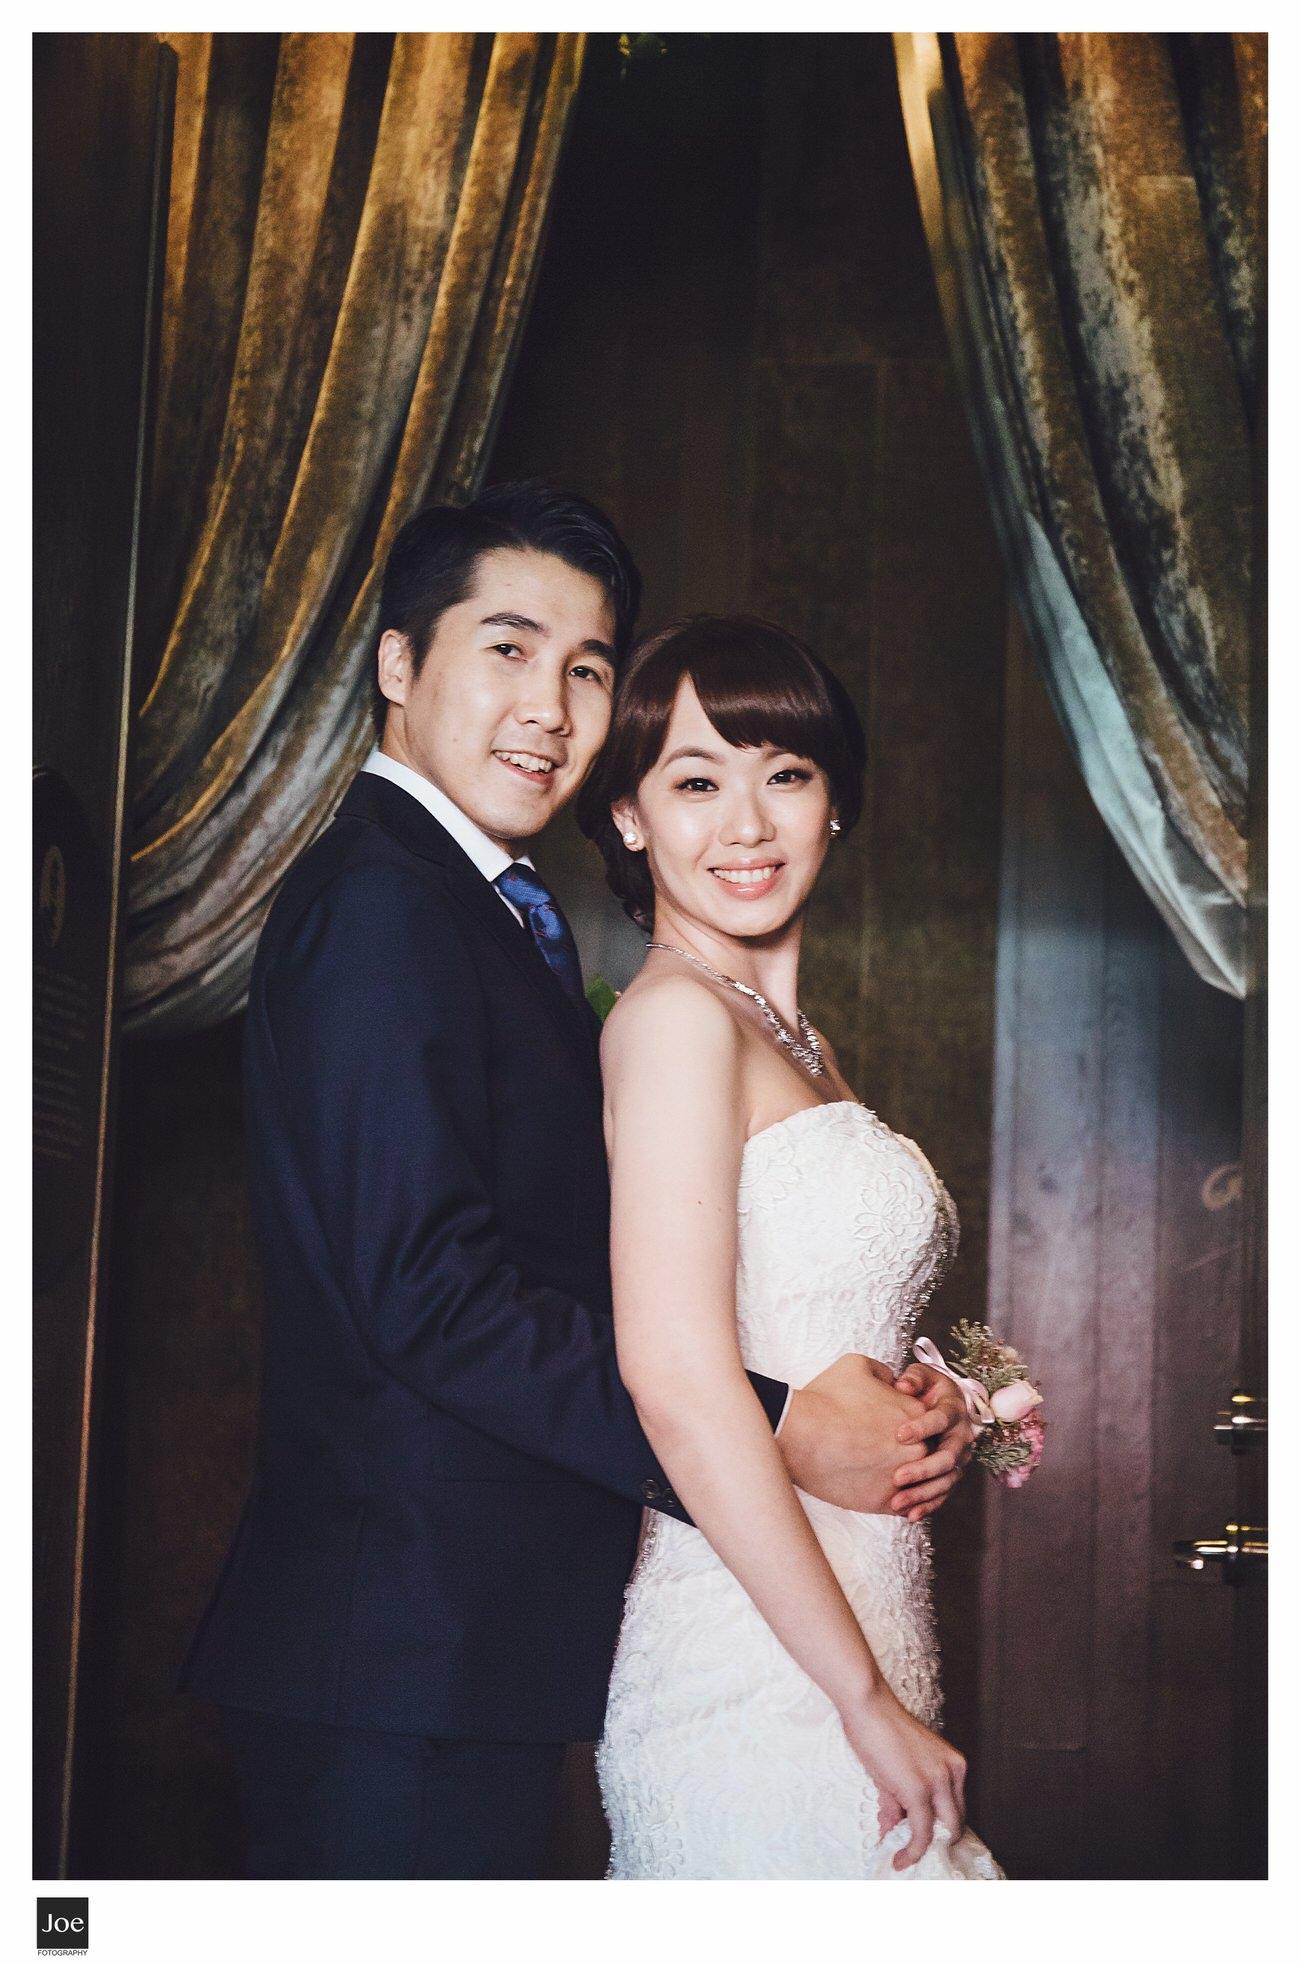 joe-fotography-wedding-photo-palais-de-chine-hotel-013.jpg